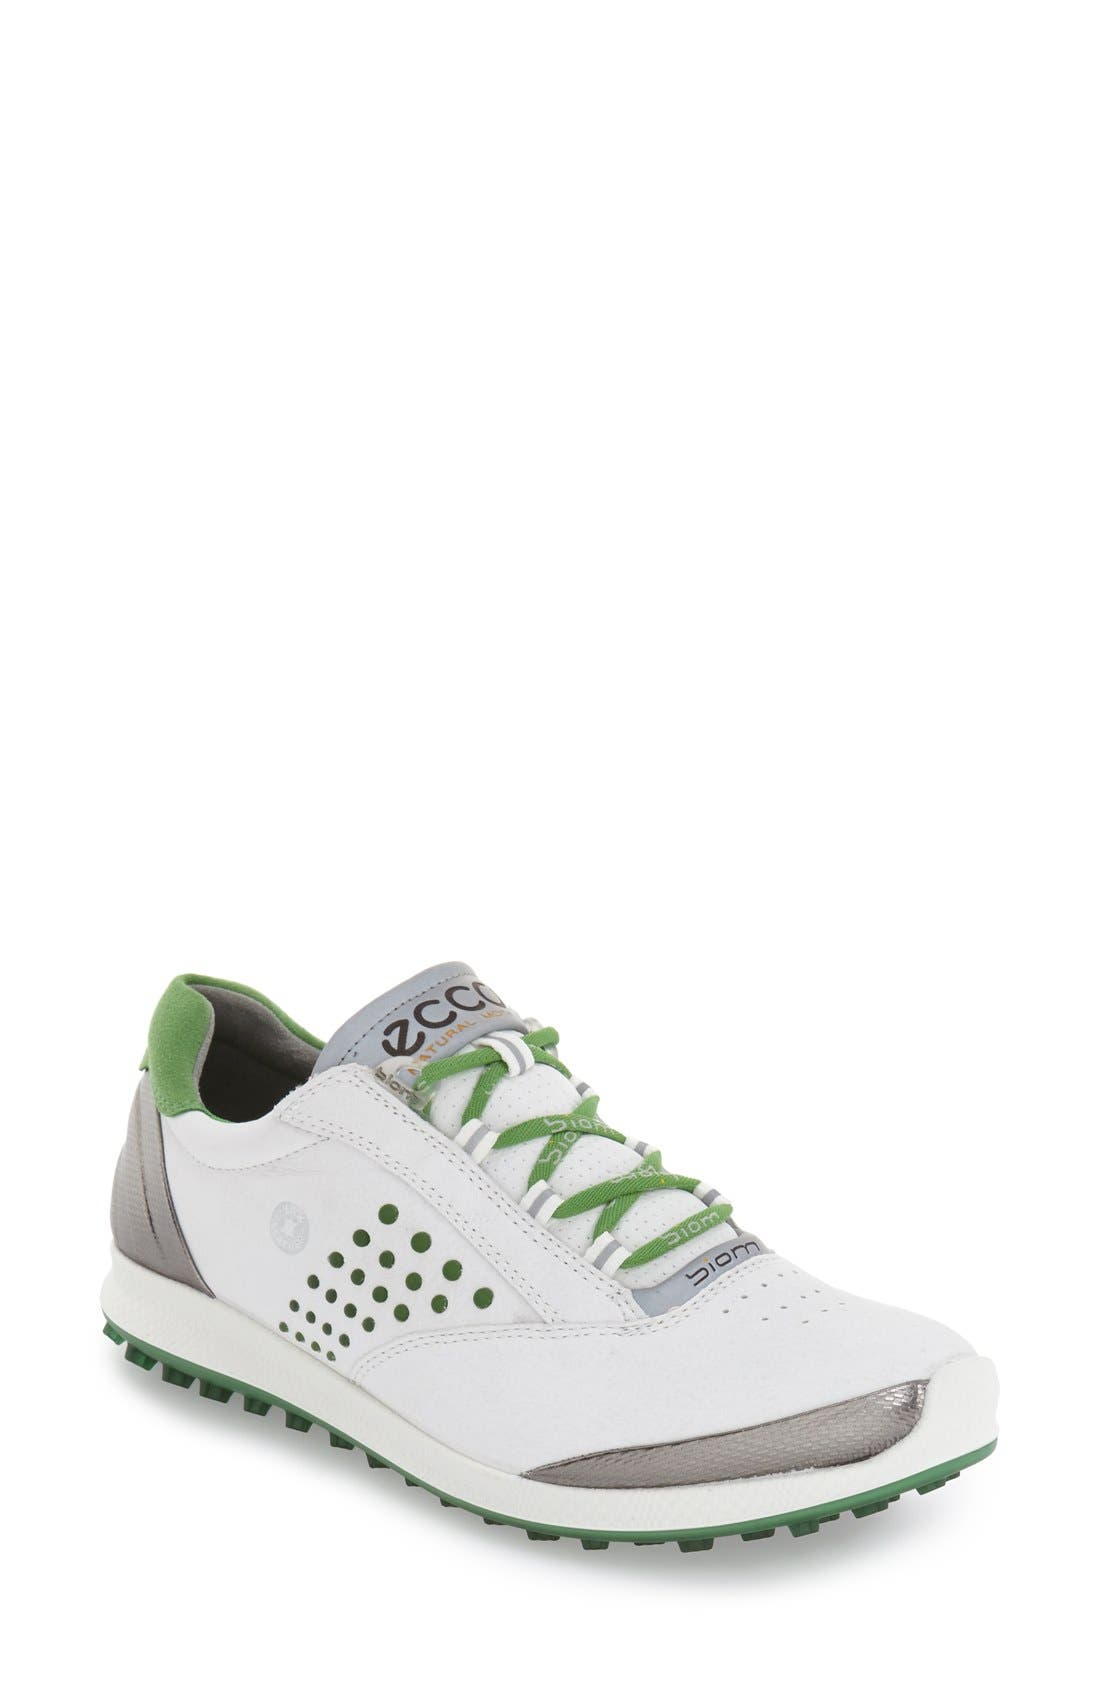 'BIOM' Hydromax<sup>®</sup> Waterproof Golf Shoe,                             Main thumbnail 4, color,